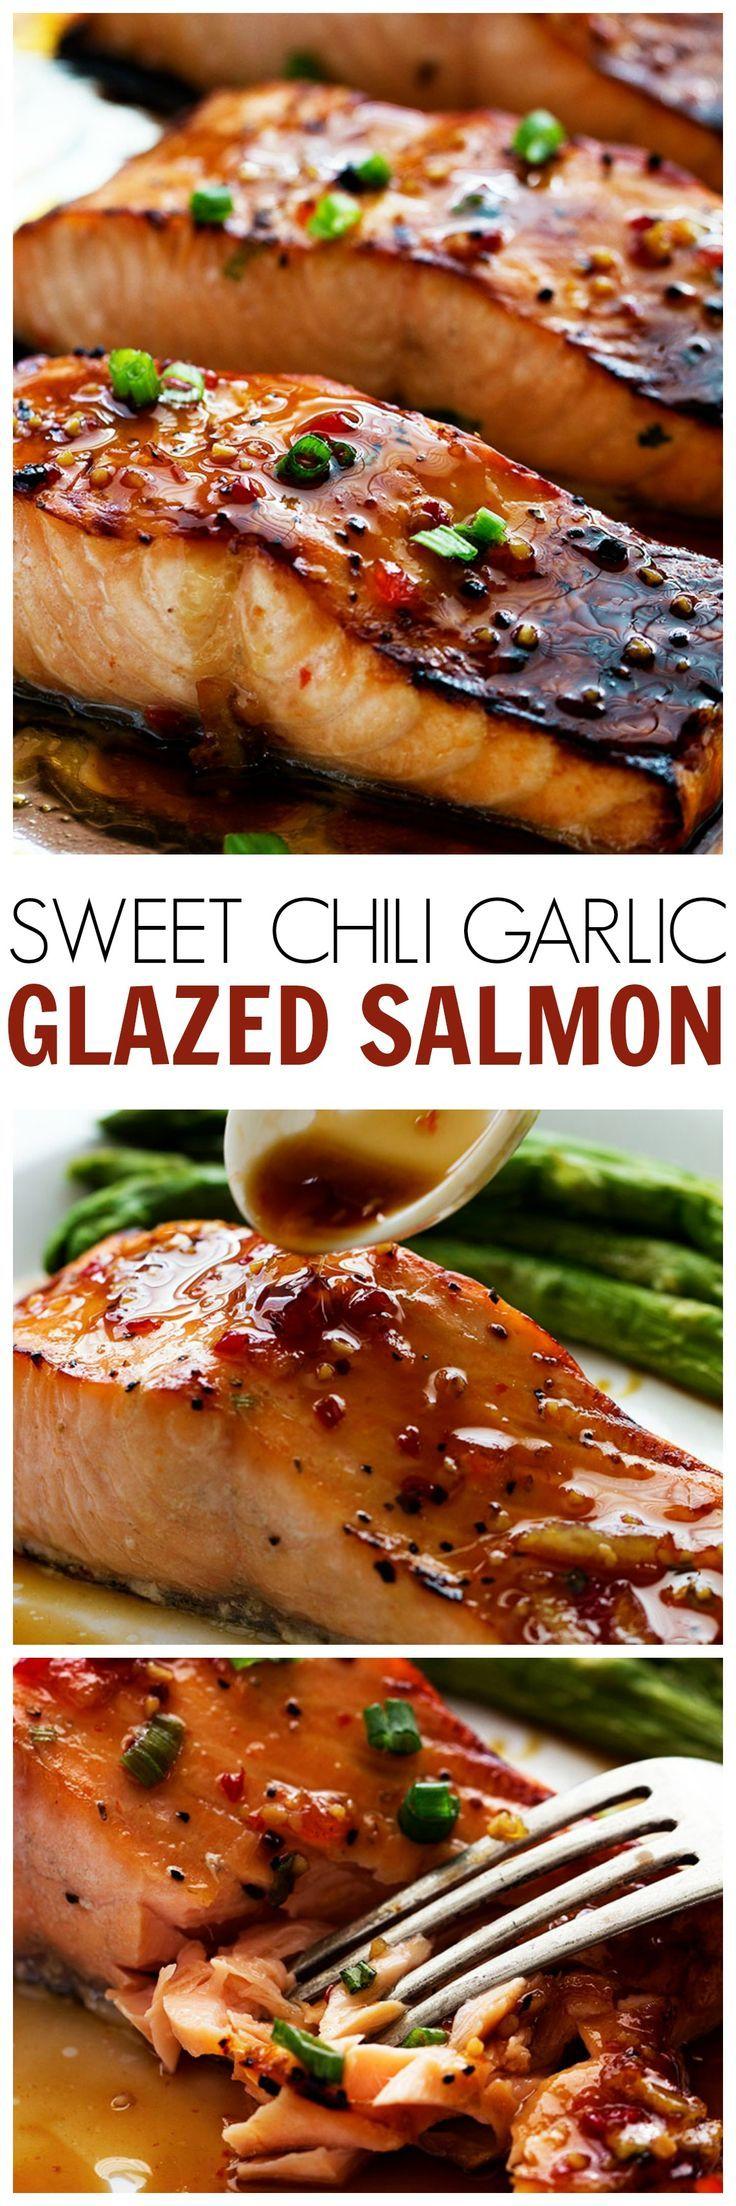 Sweet Chili Garlic Glazed Salmon | The Recipe Critic